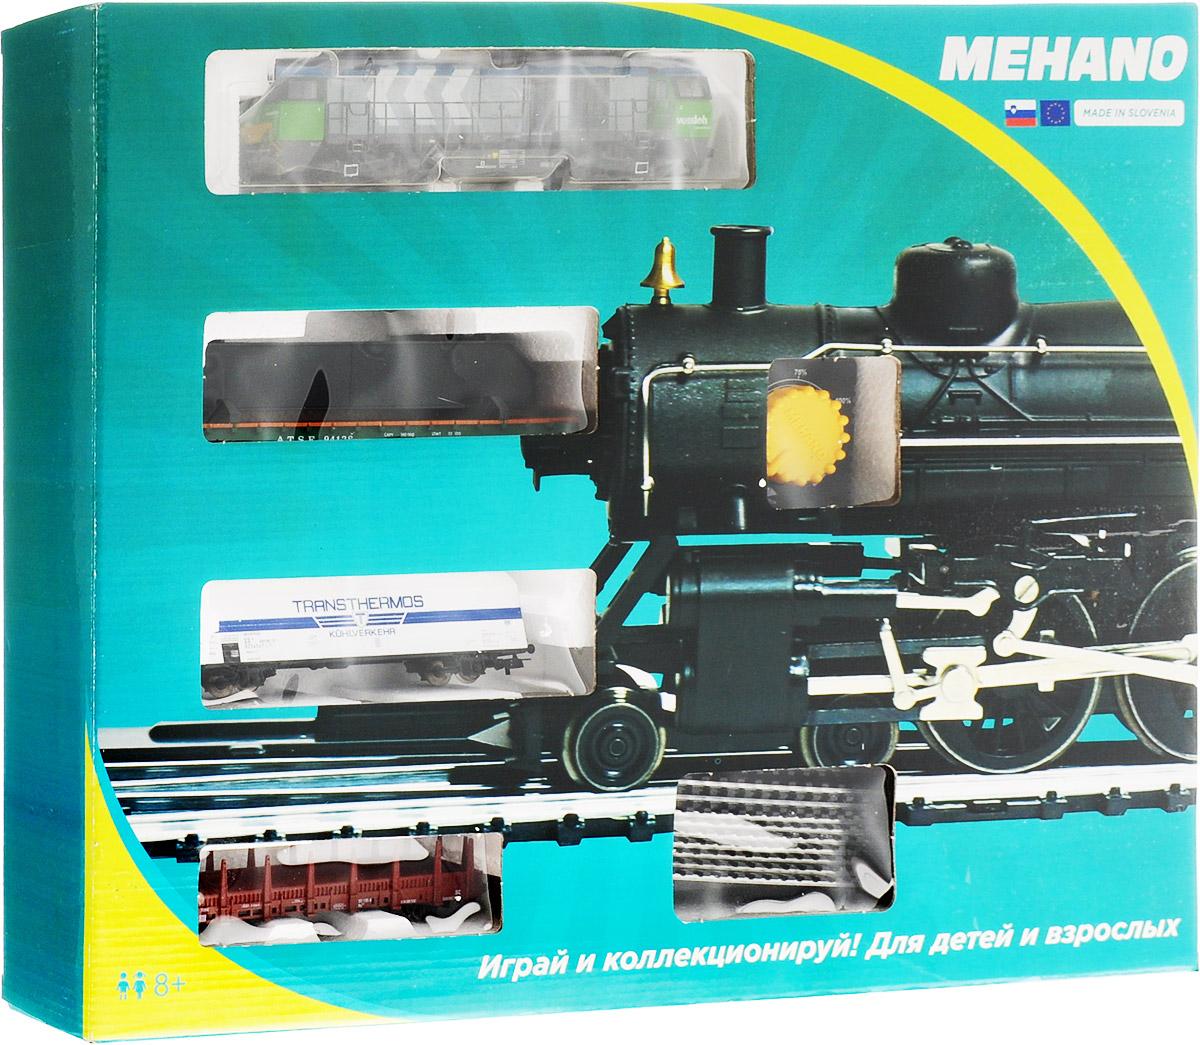 Mehano Железная дорога Prestige с тепловозом Vossloh G2000 - Железные дороги